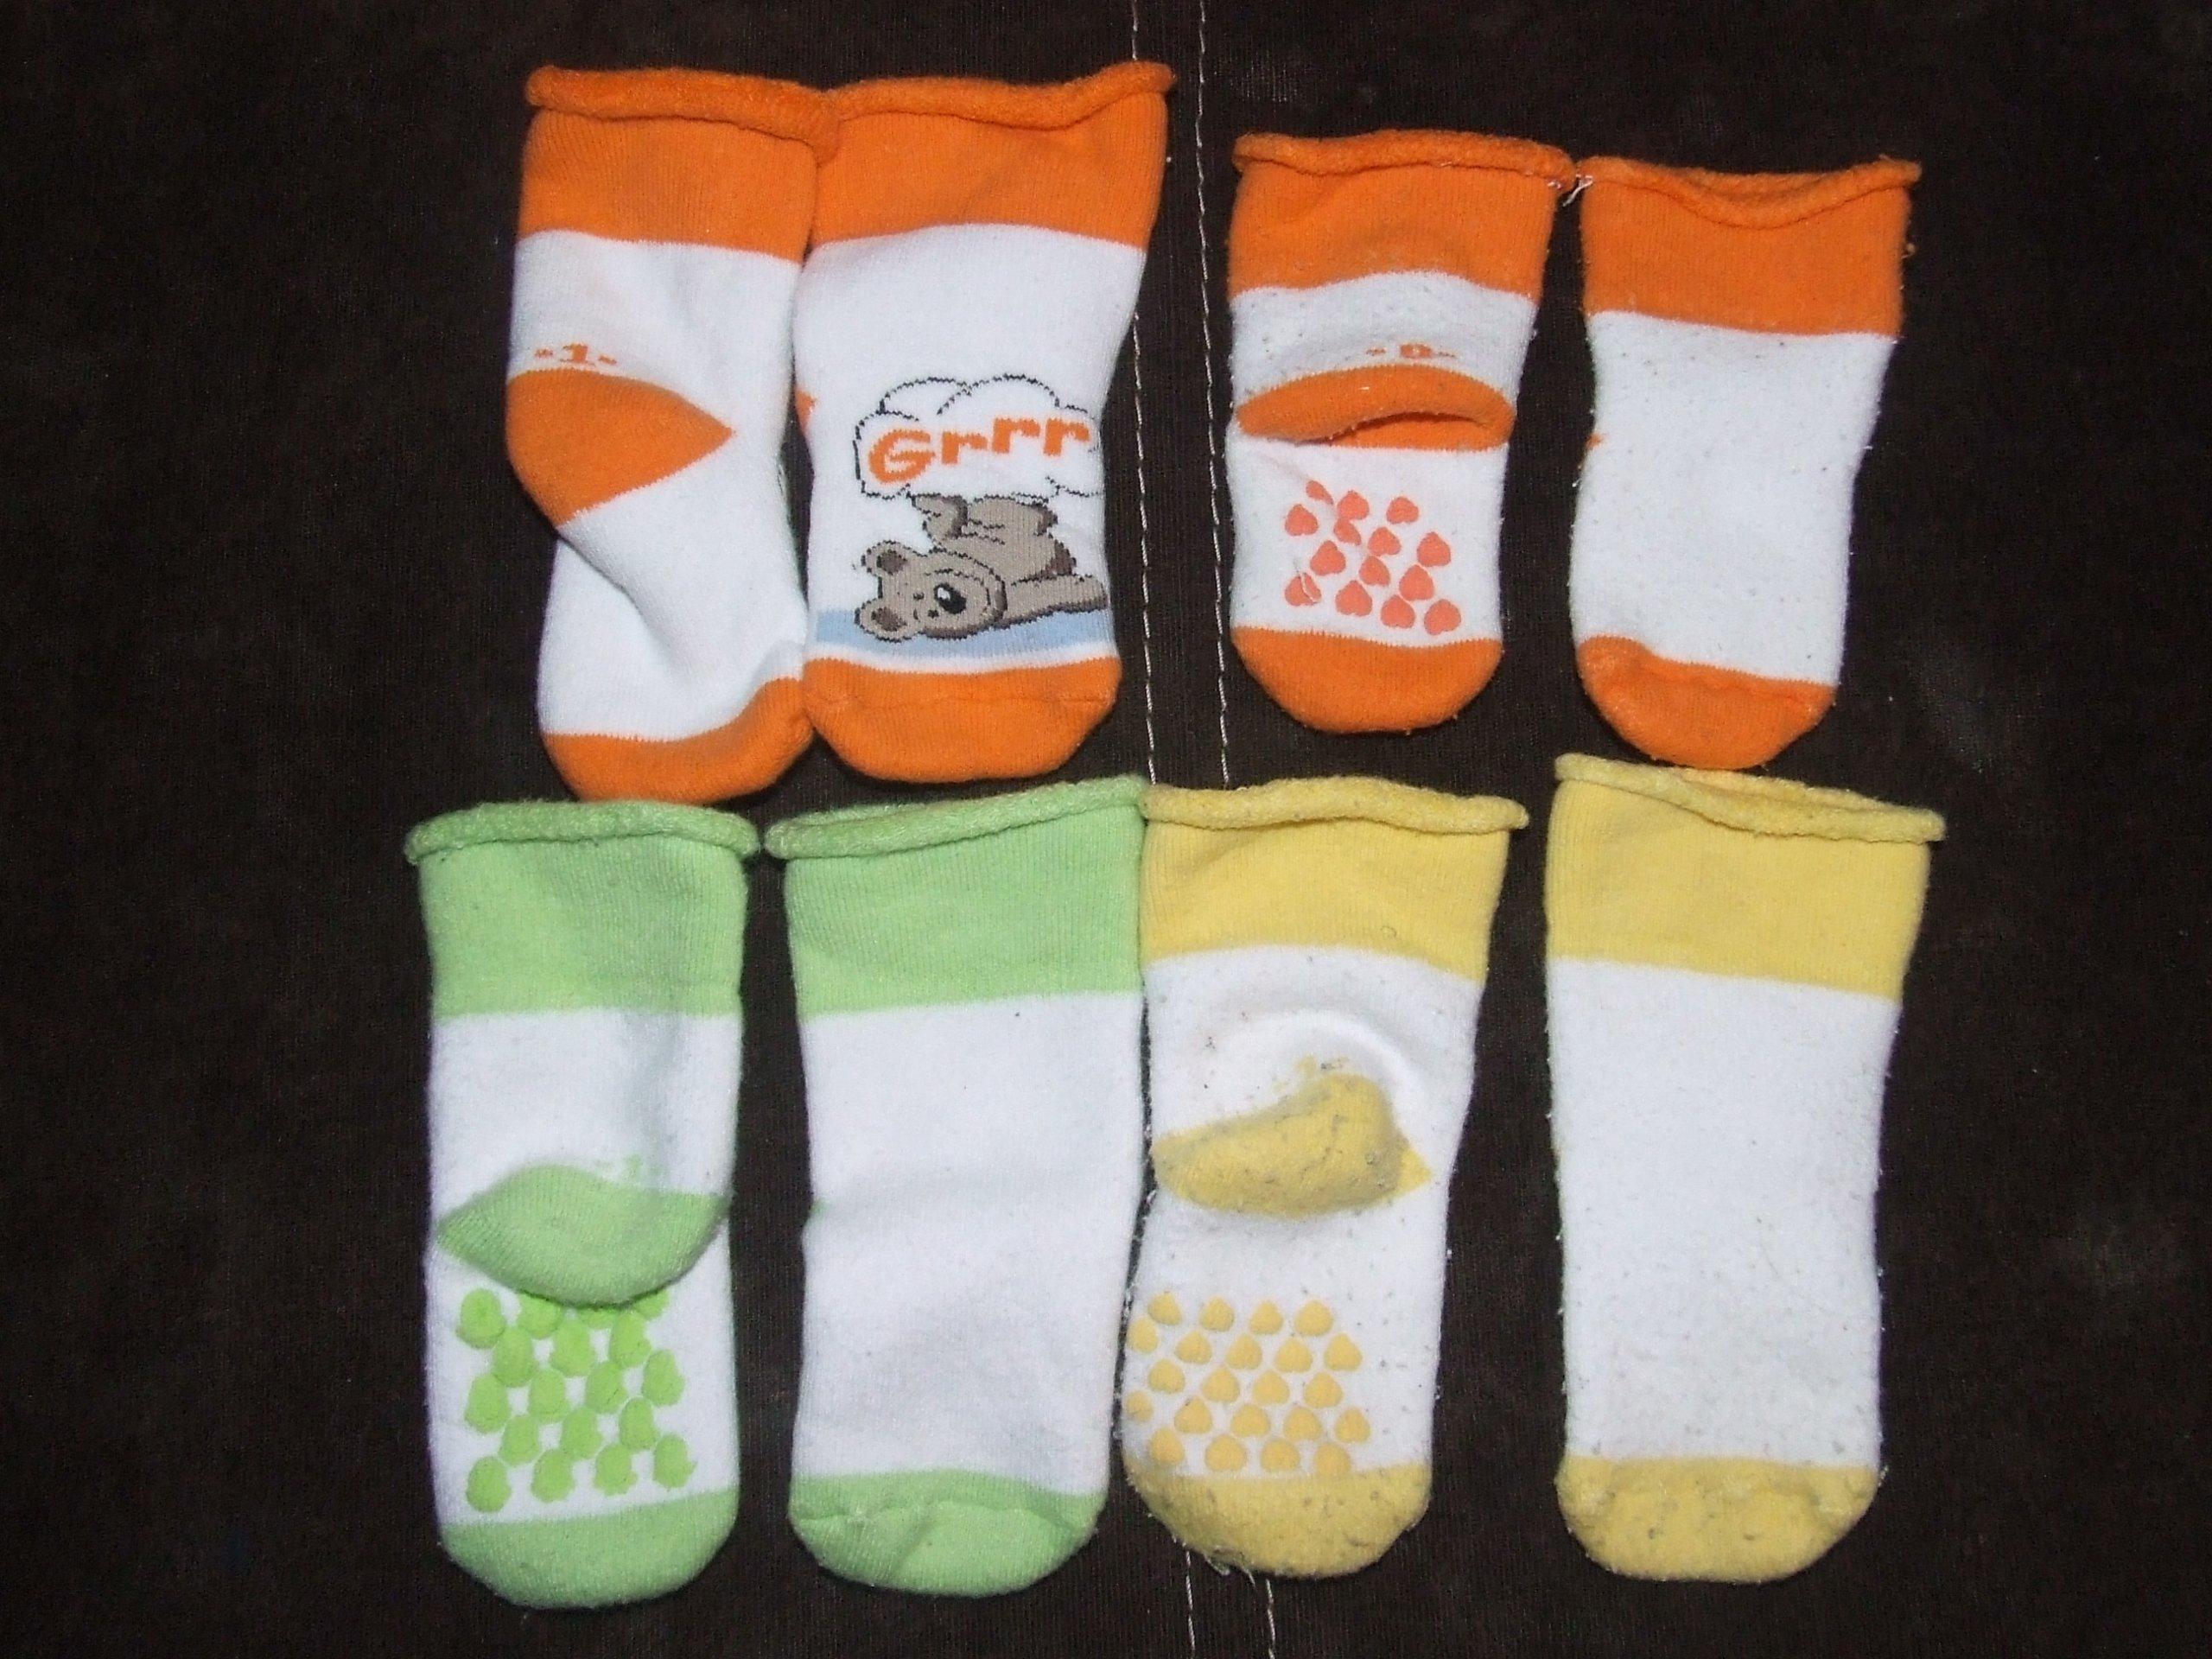 Skarpety frotte 4 szt dla niemowlaka 0-6 m [345]